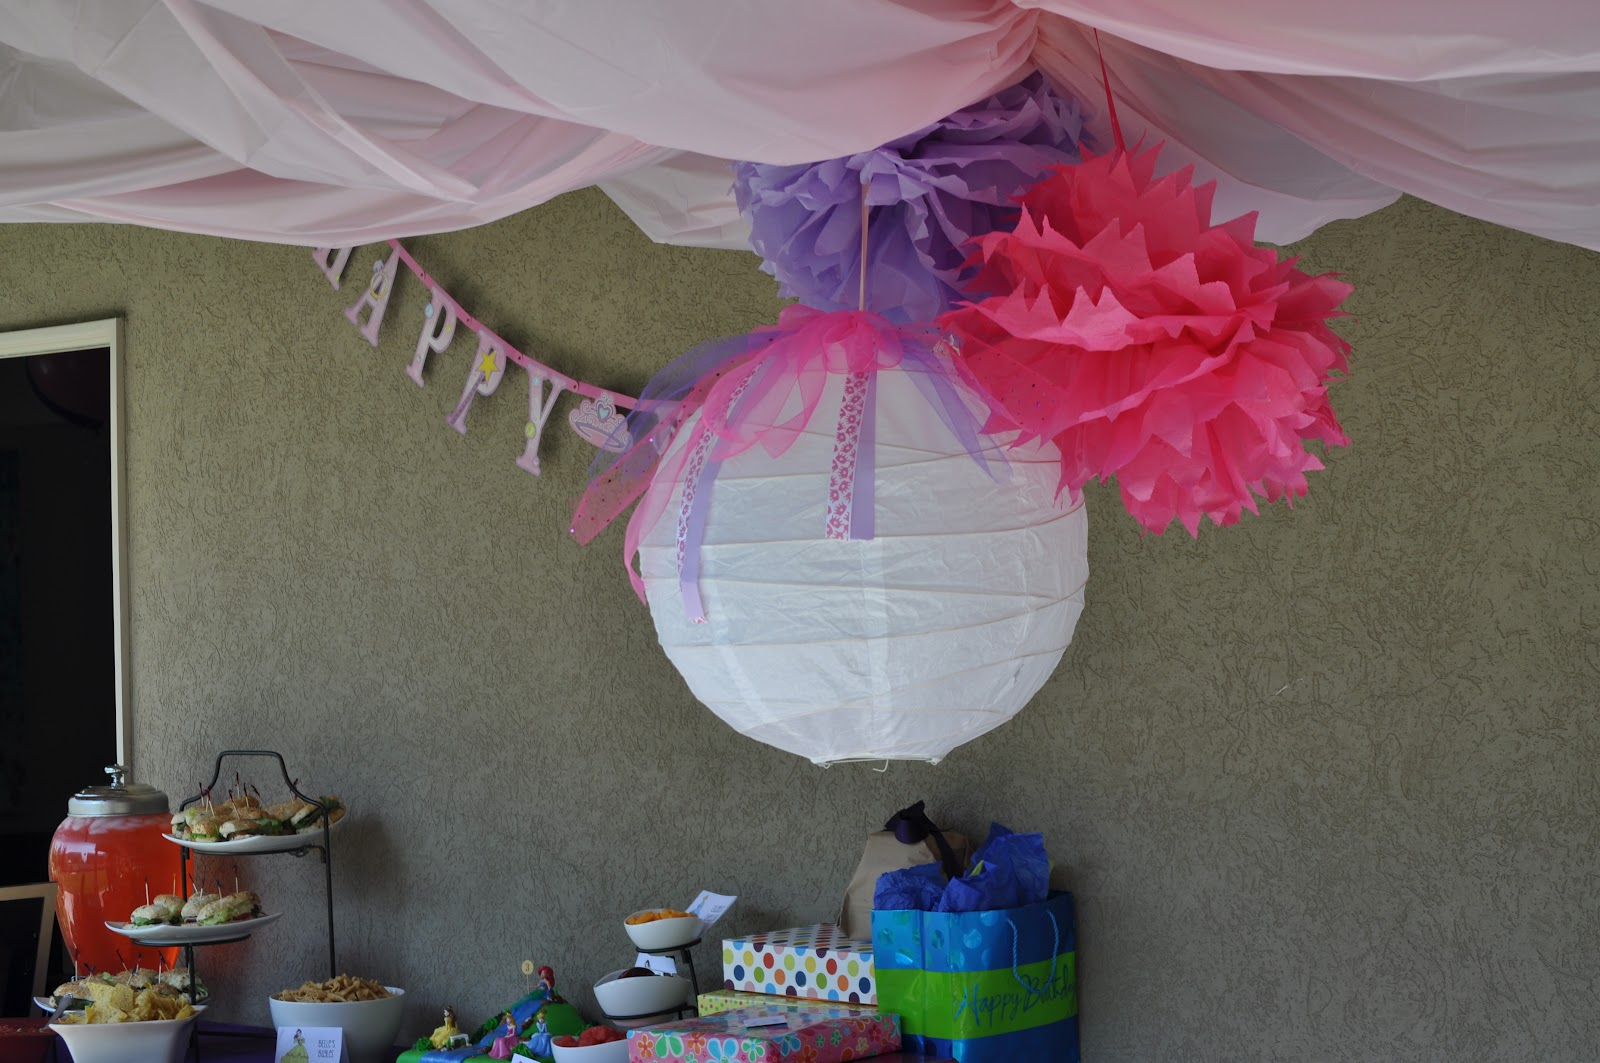 Disney princess birthday party events to celebrate for Princess birthday party crafts